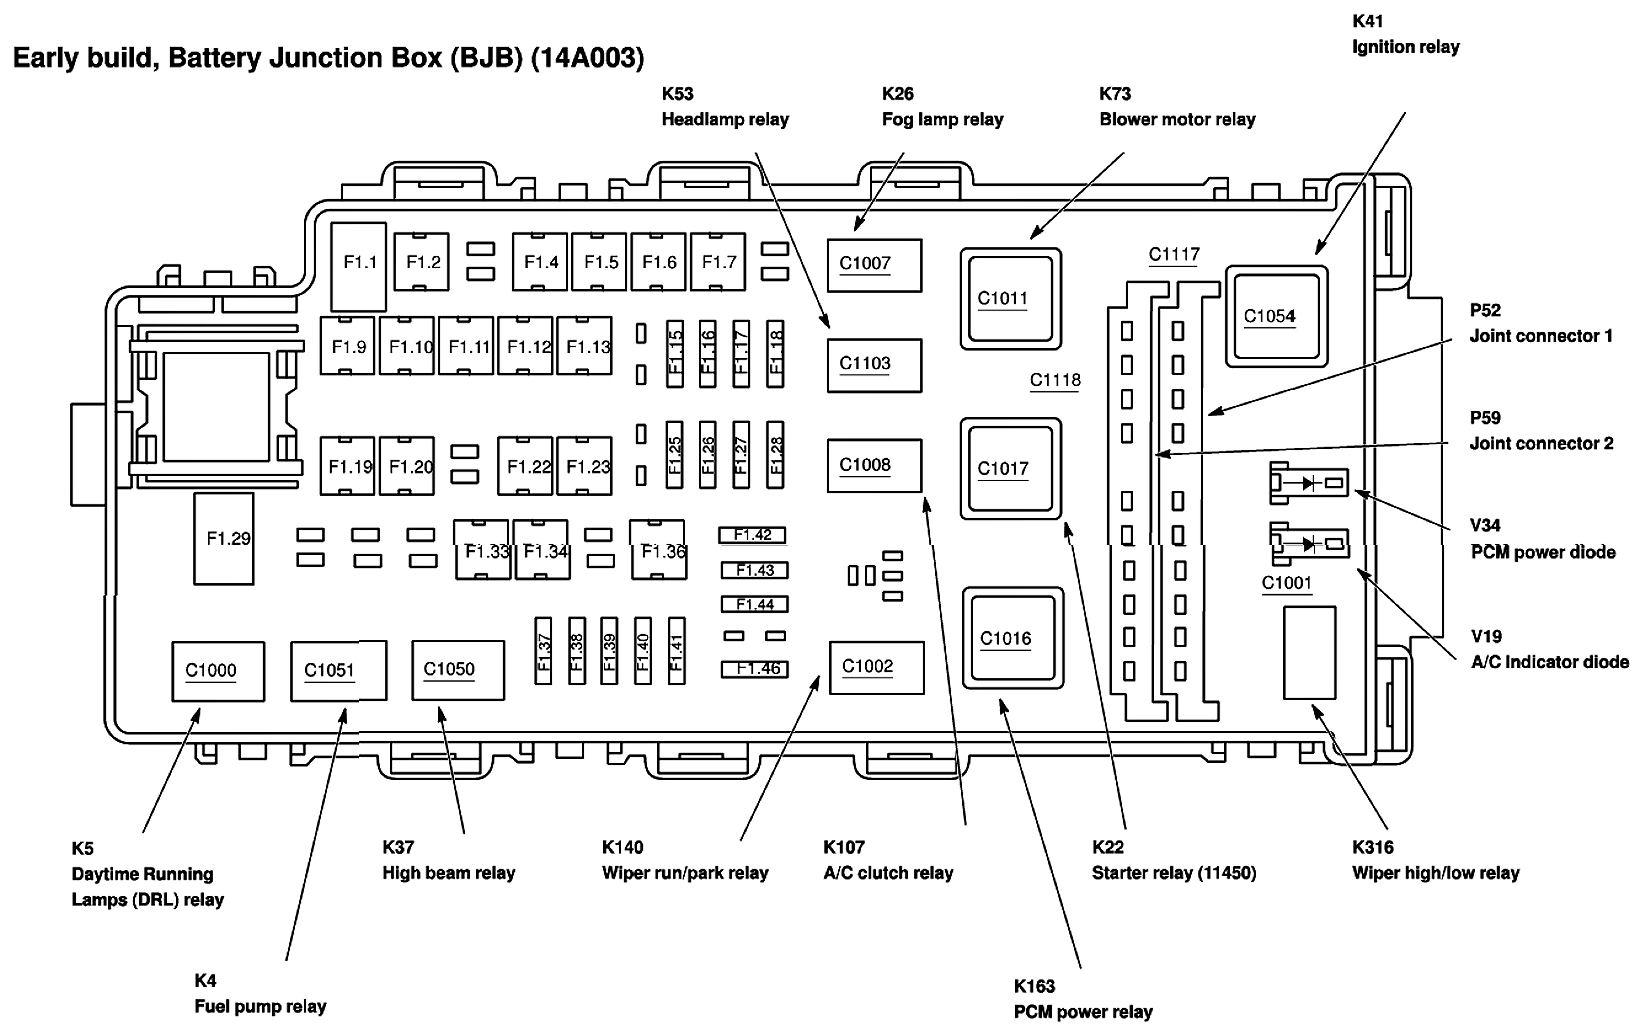 Sensational 2002 Ford Explorer Fuses Diagram Wiring Diagram Wiring Cloud Loplapiotaidewilluminateatxorg